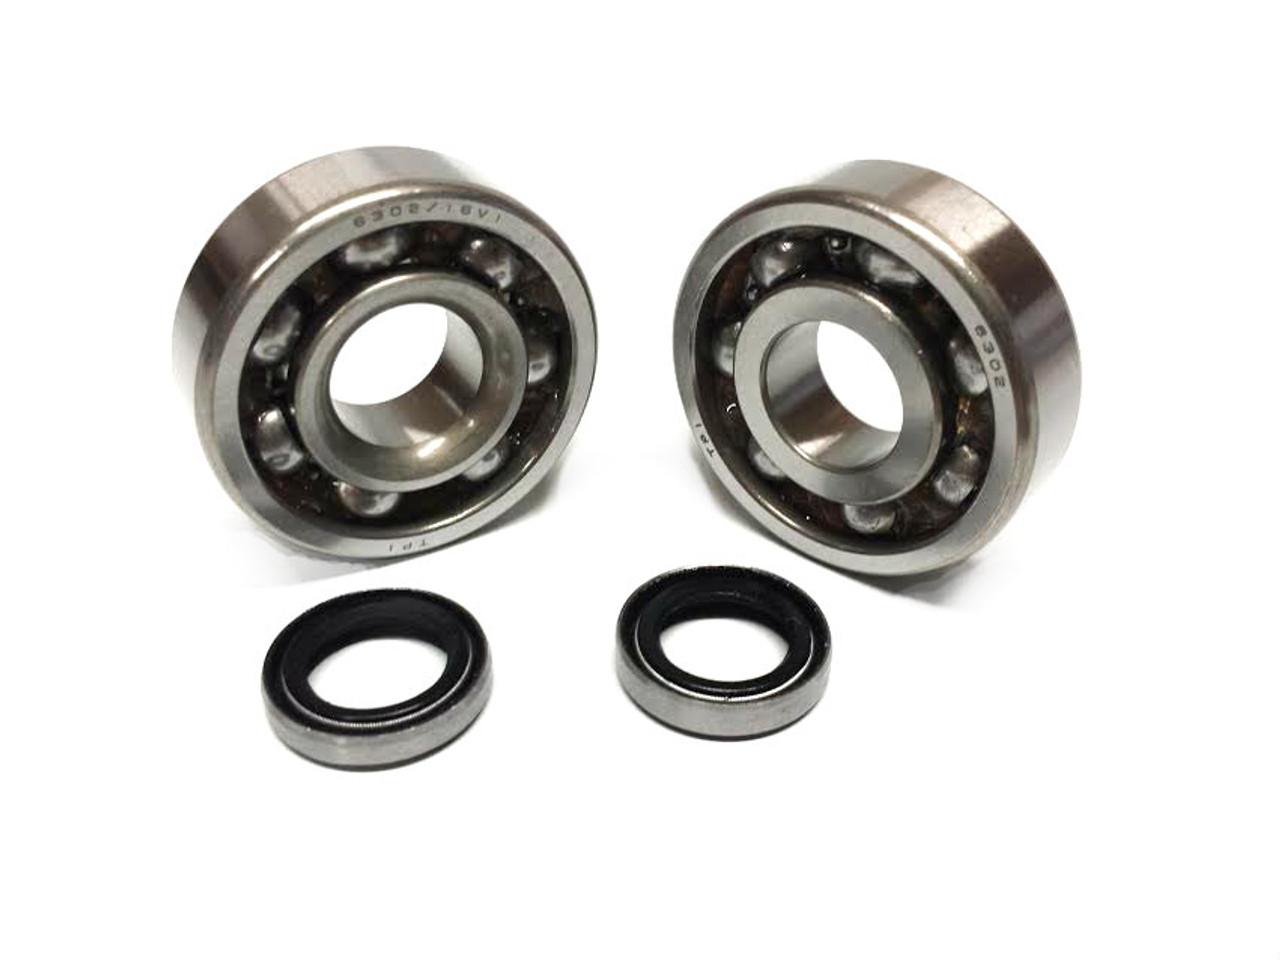 SKF Motobecane Engine Bearings and Seals Set - 6302